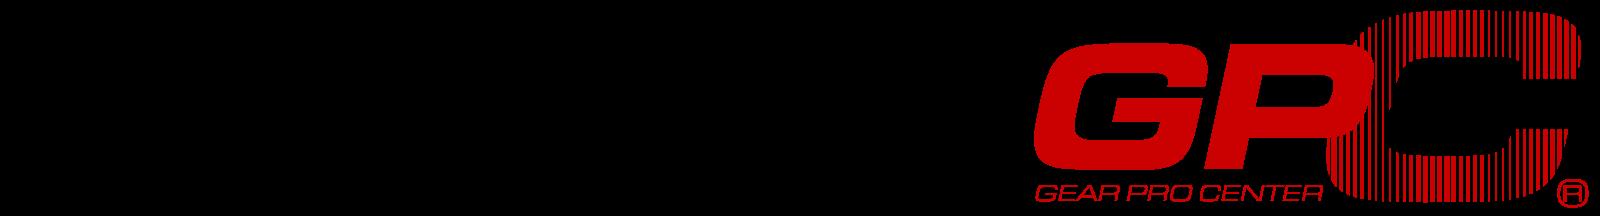 Lookwell-GPC-logo-light-web